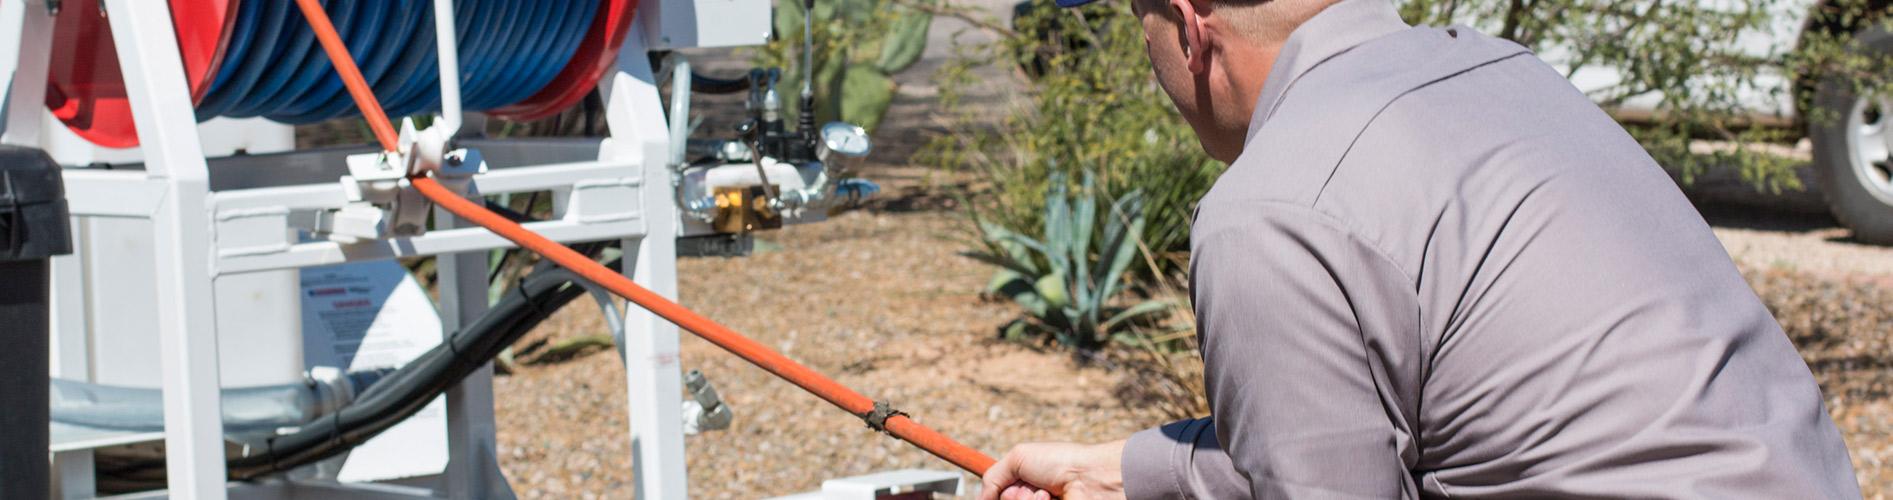 Home Tucson Plumbing